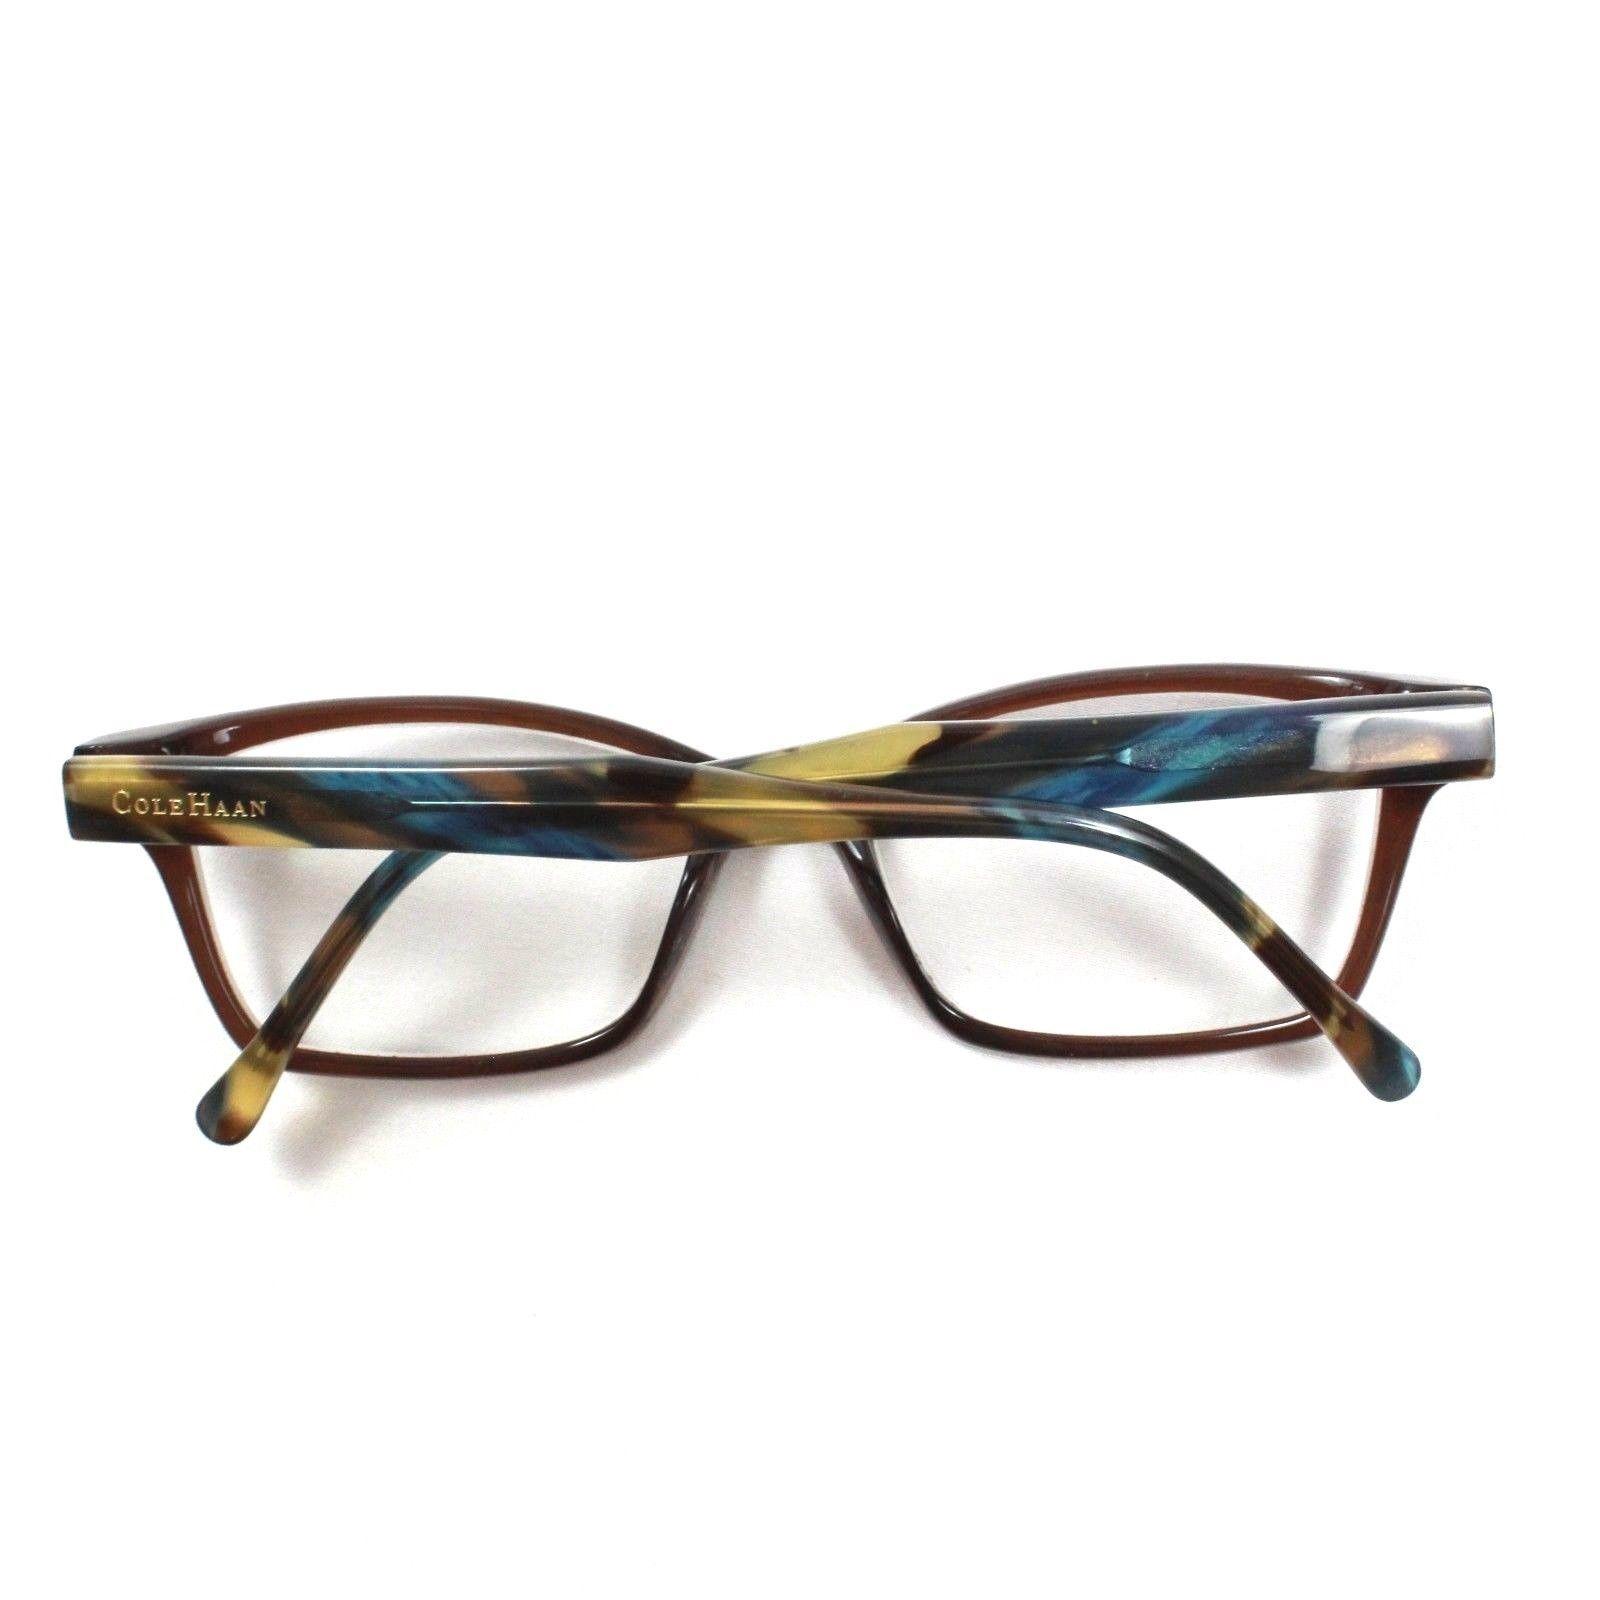 e27da8ea349e7 Cole Haan Women s Glasses CH 1021 Brown Marbel Eyeglasses 50 Eye Size  PLASTIC